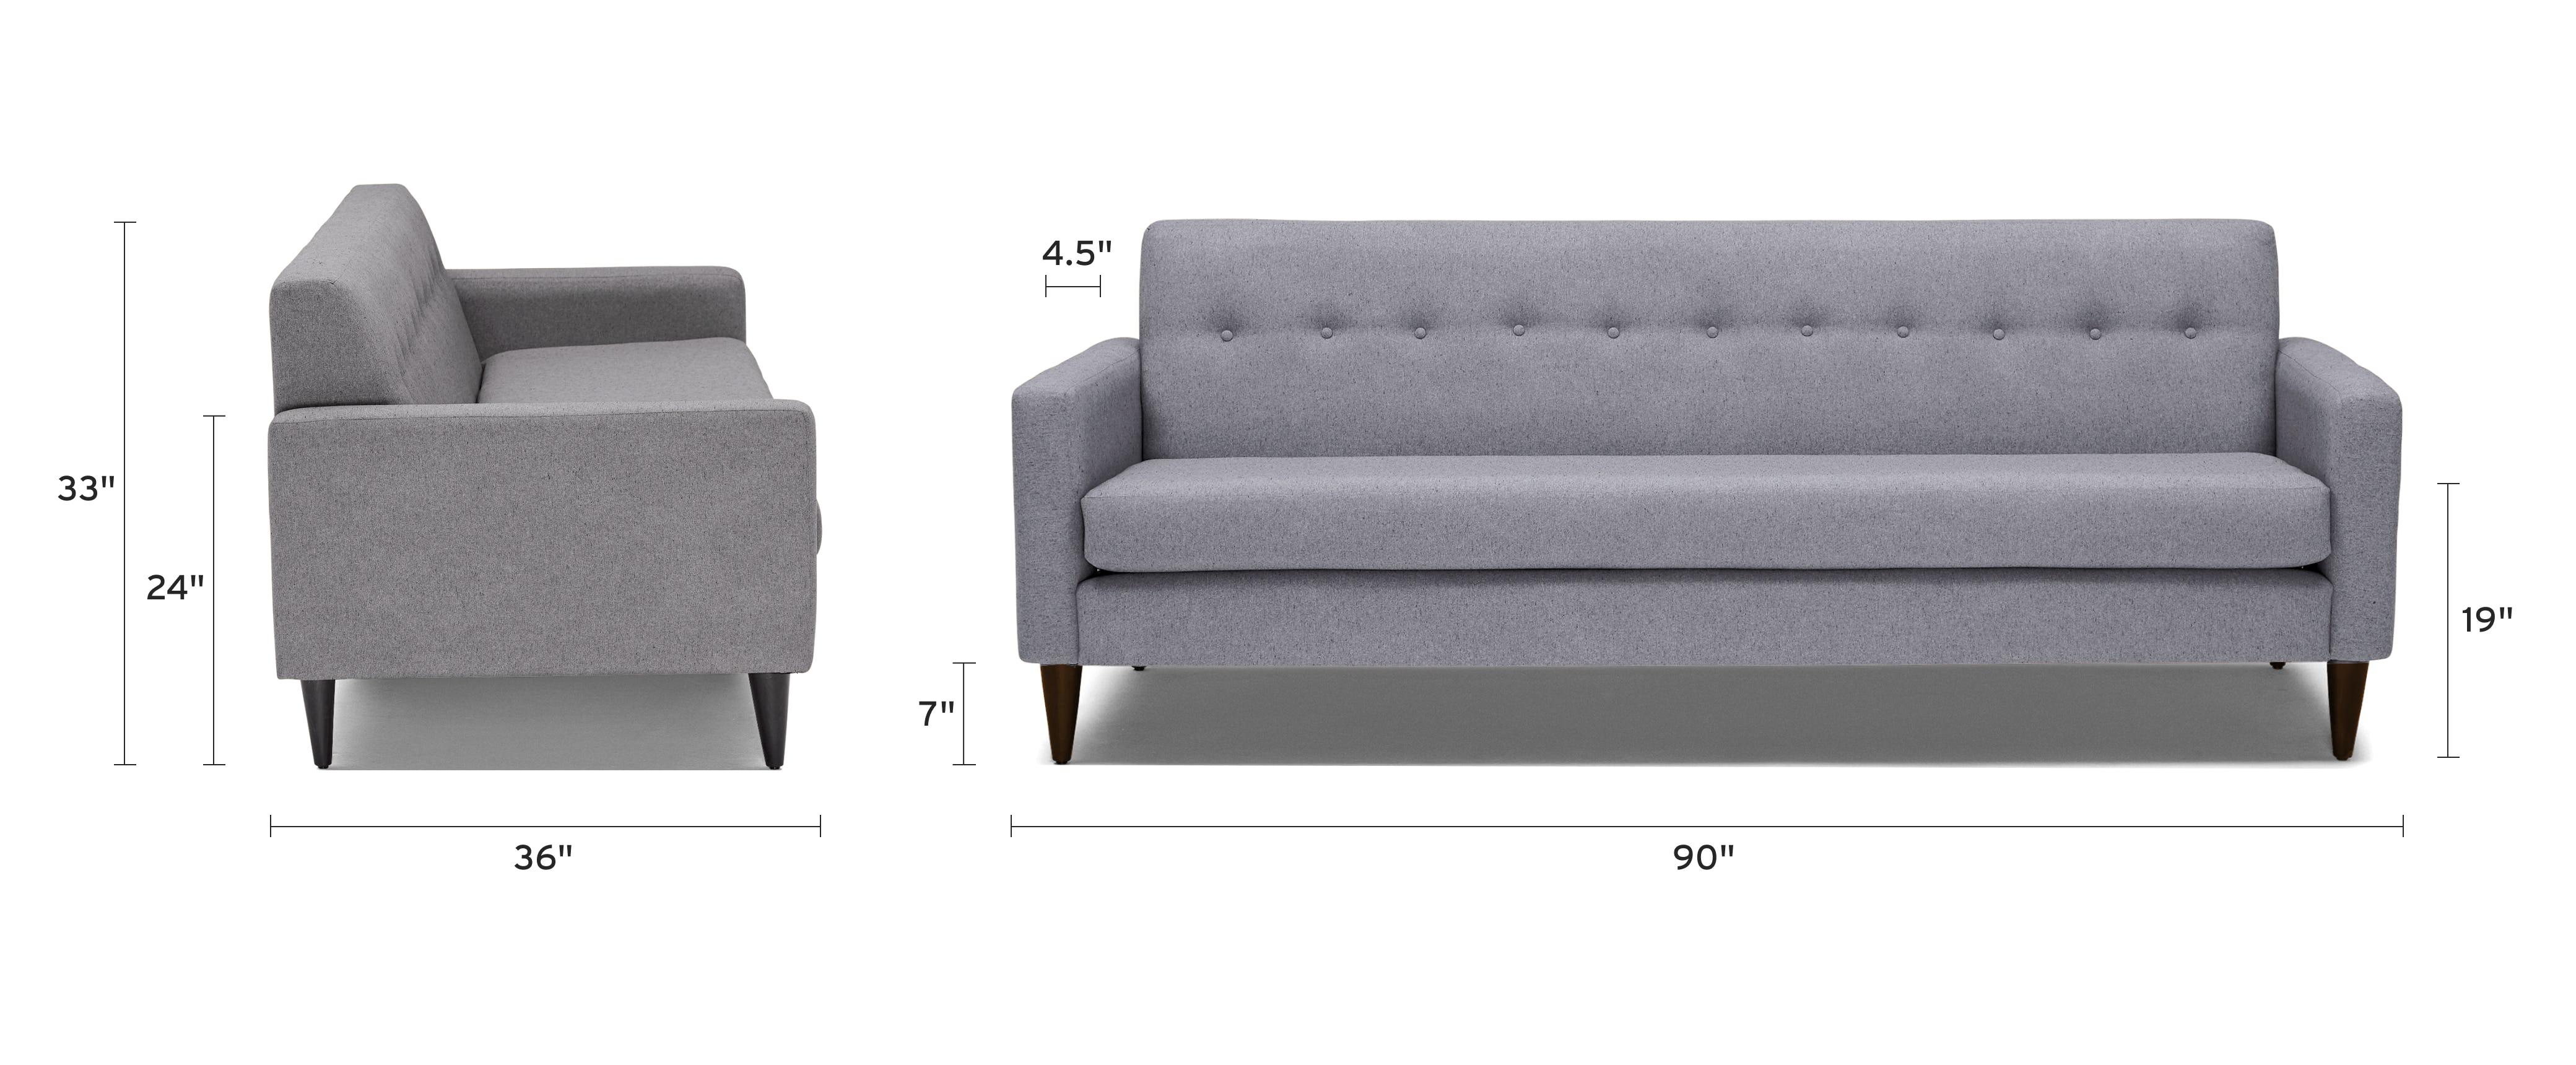 korver sofa dimensional image